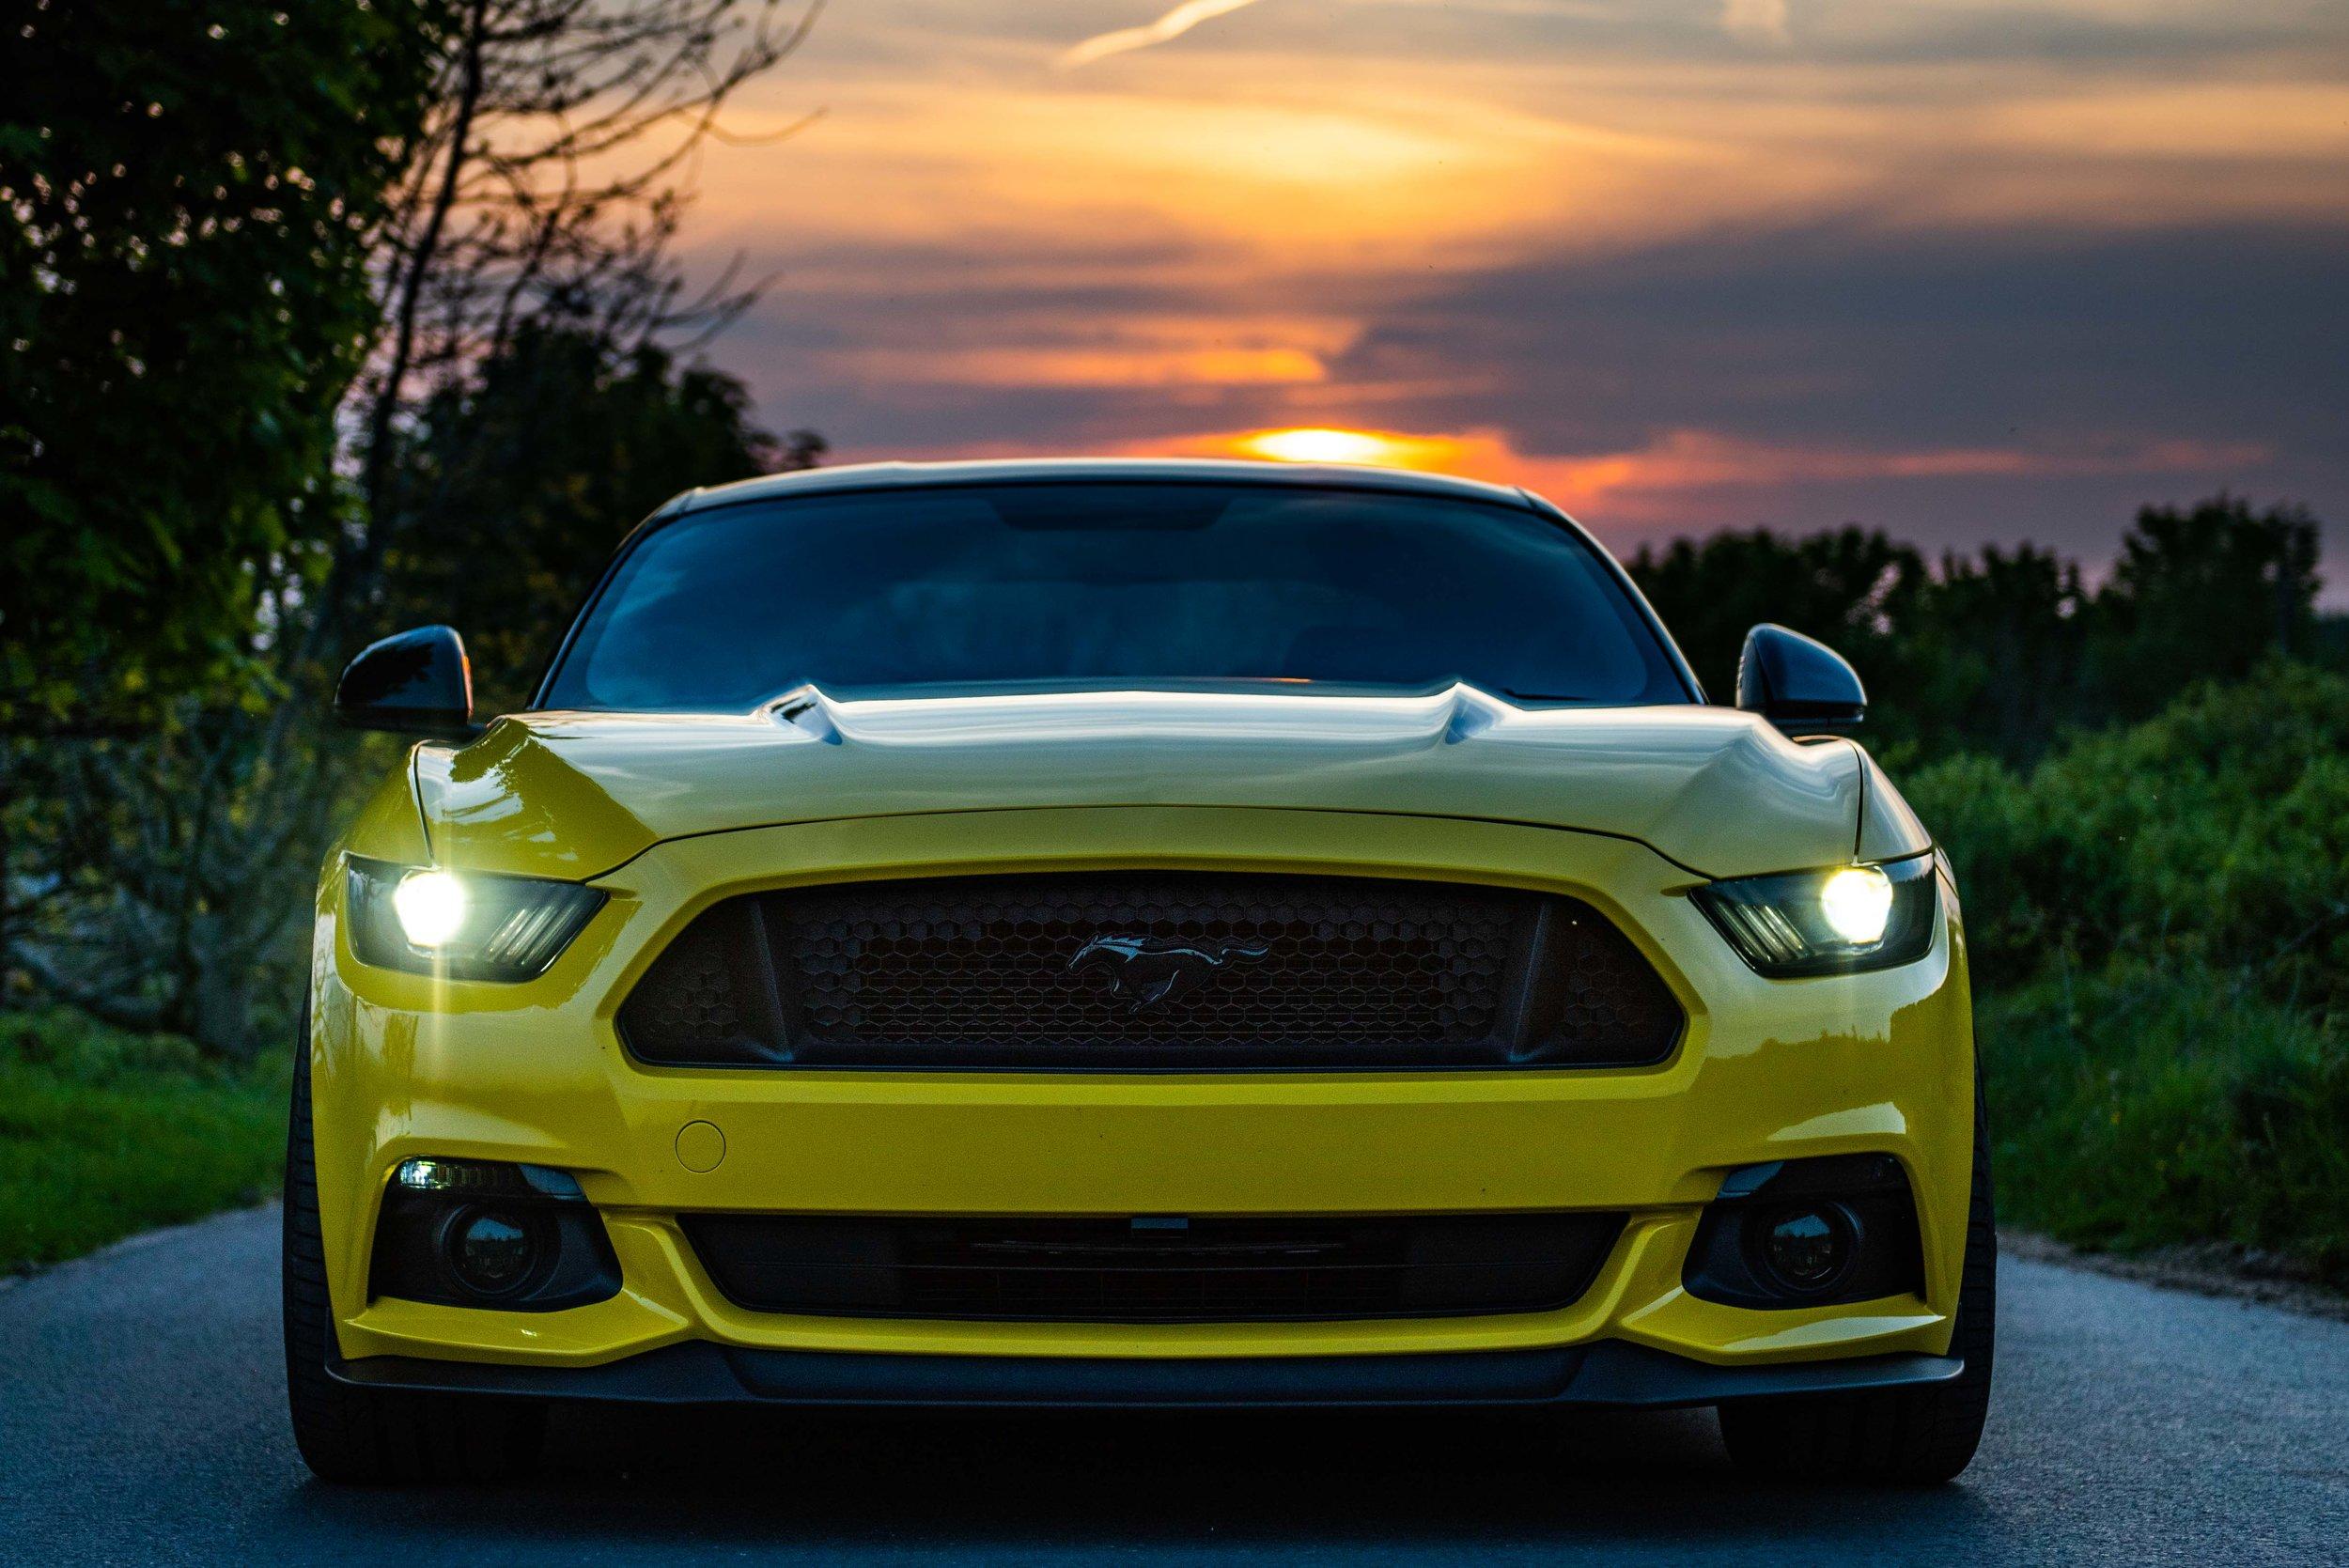 Mustang-22.jpg